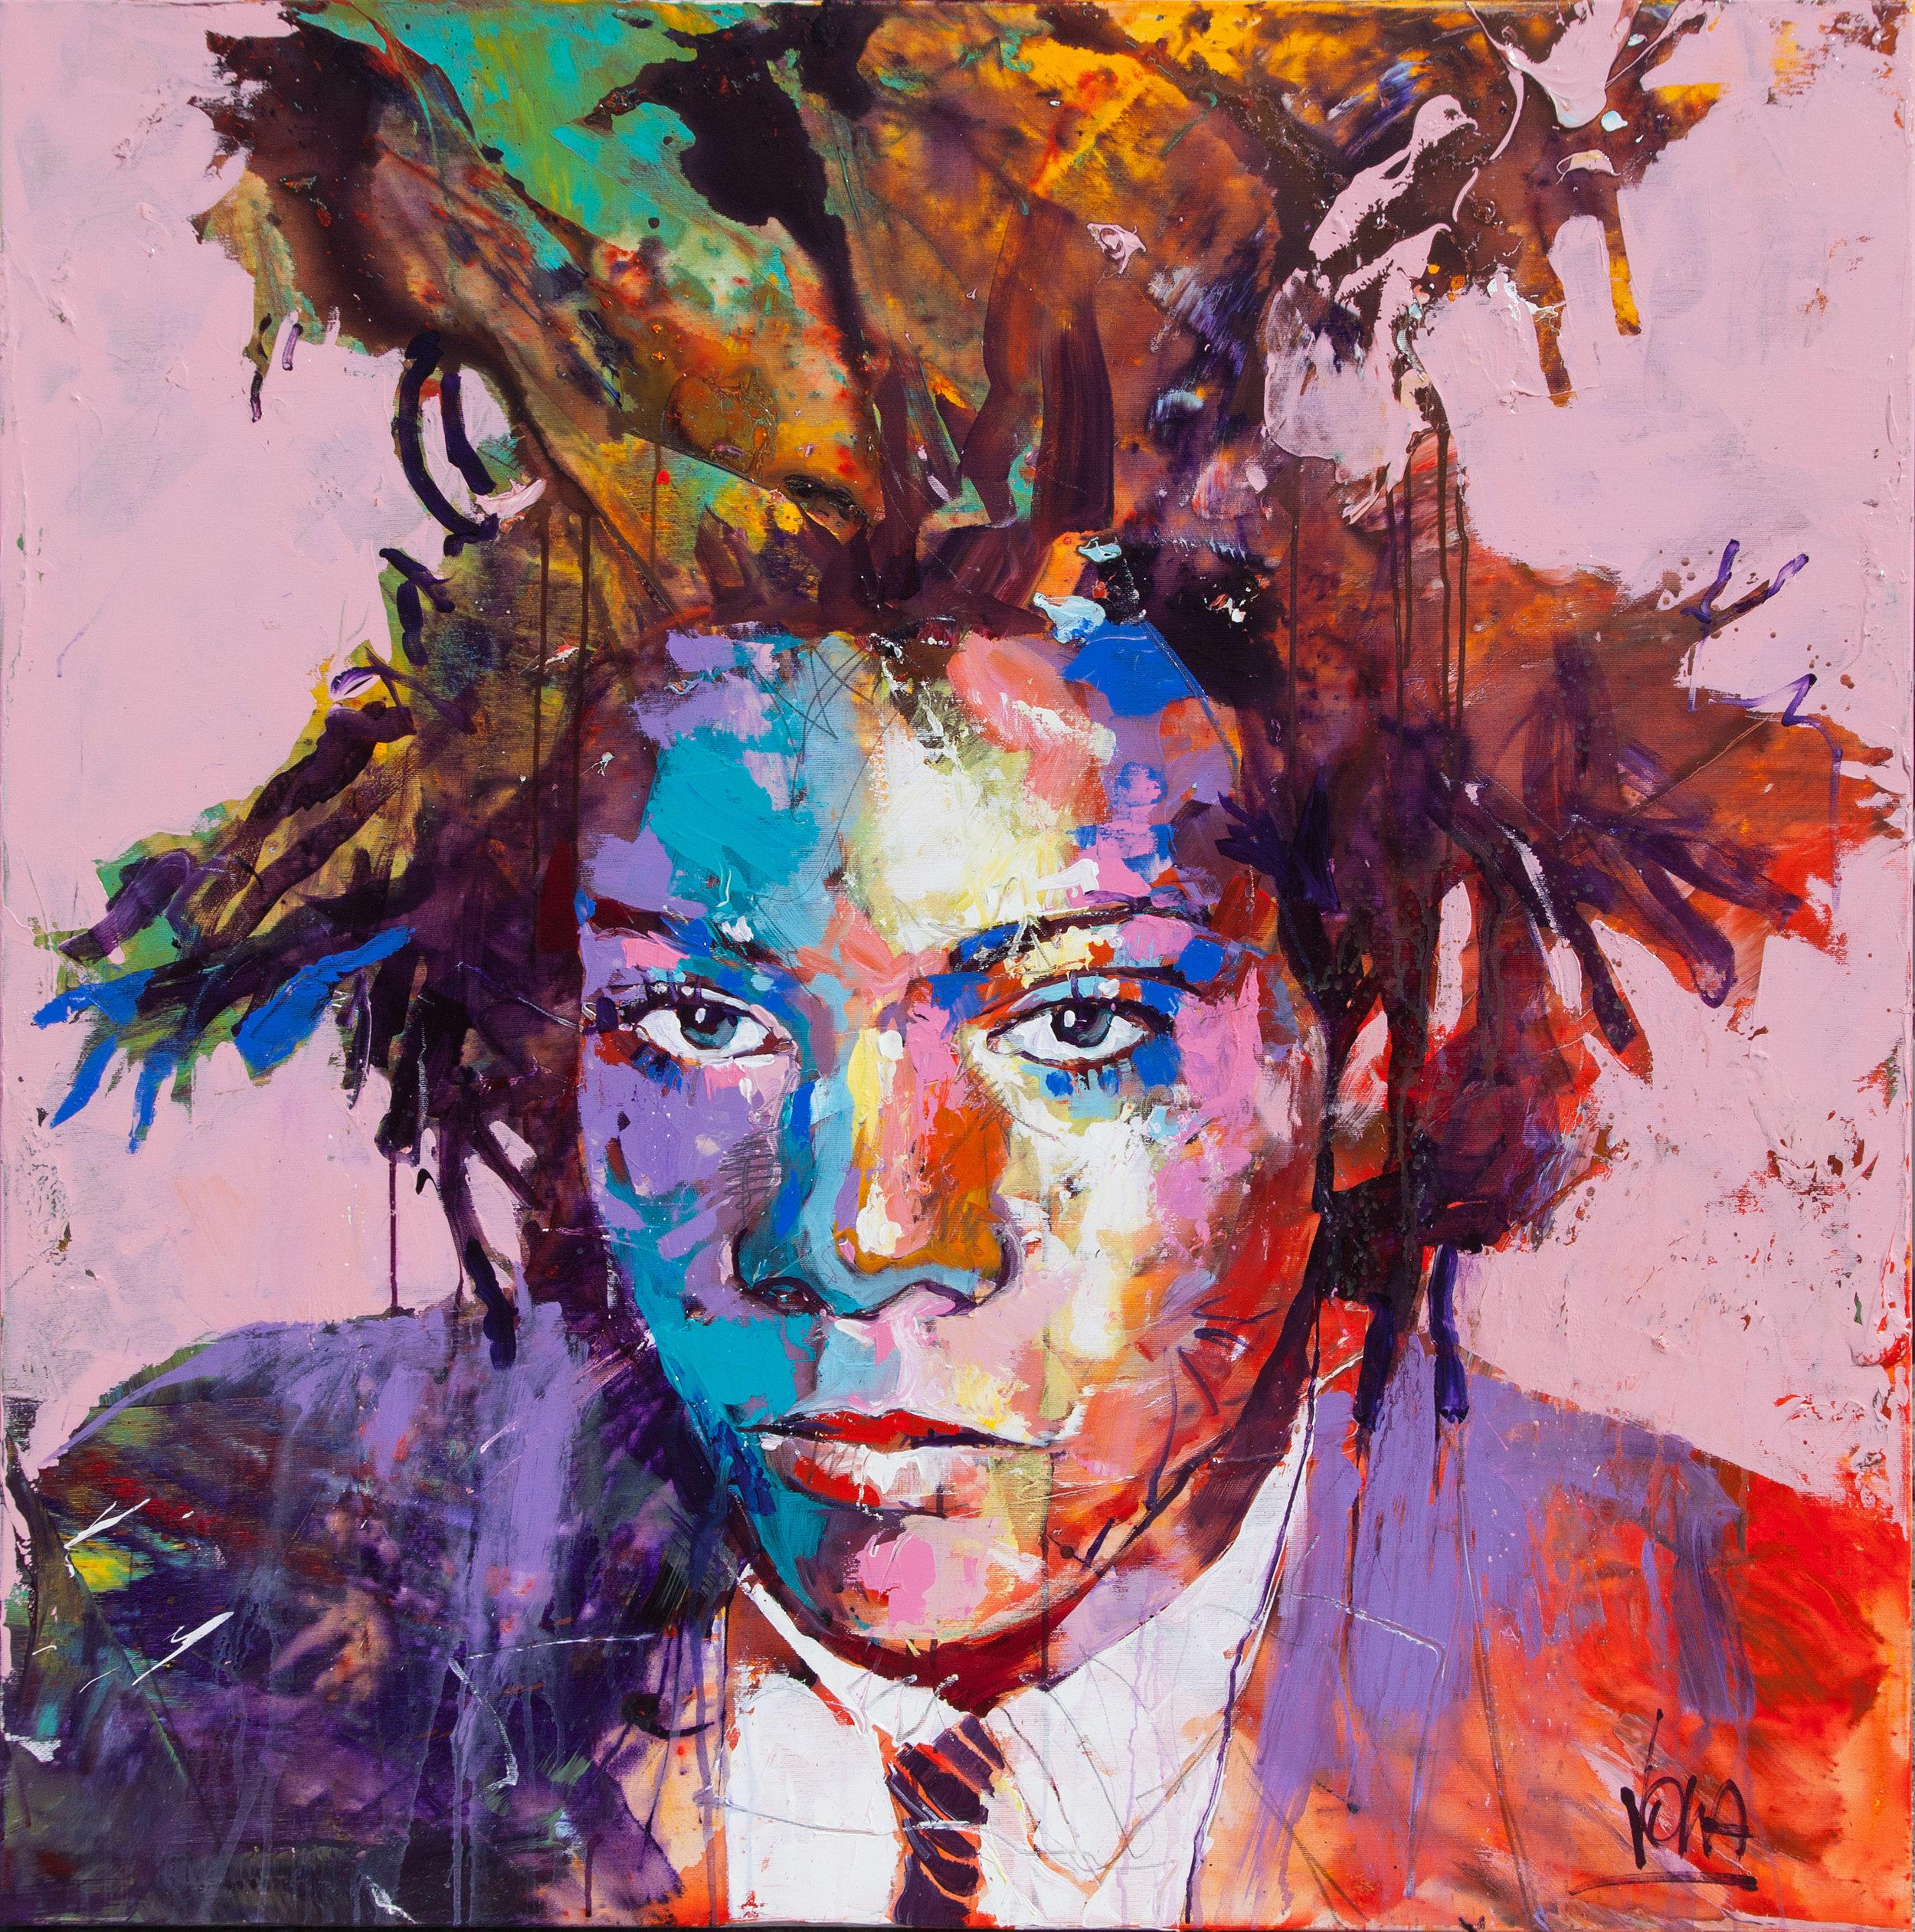 Basquiat, 120x120 cm/47,2x47,2 inch, Acrylic on Canvas